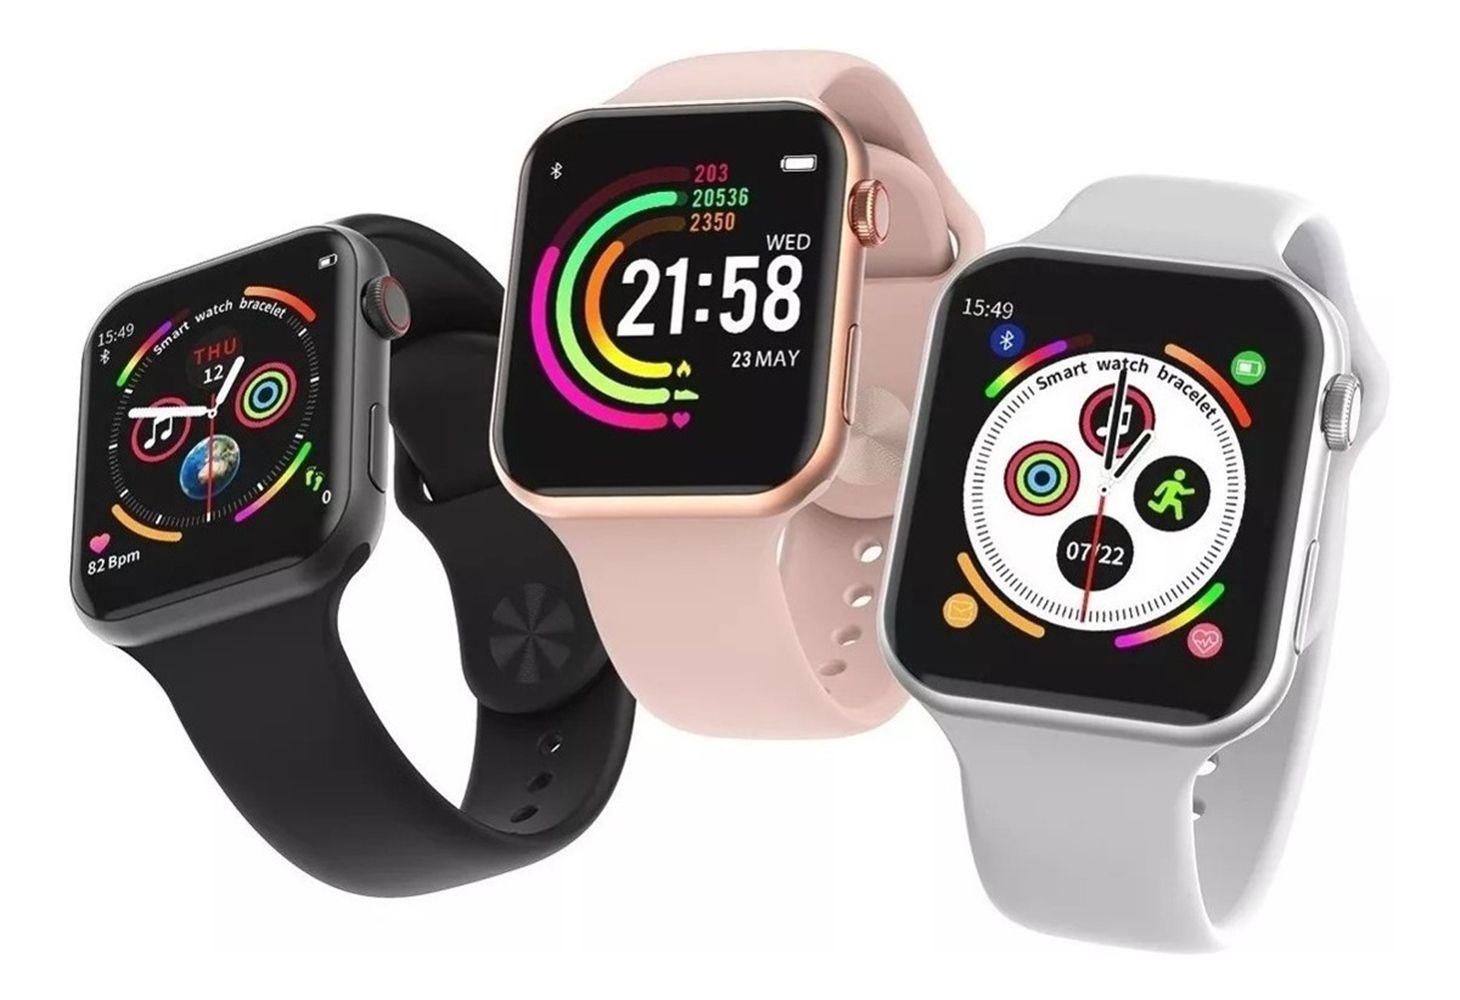 Relógio Smartwatch F10 Full Touch à Prova d'água 1.54 Polegadas Android iOS